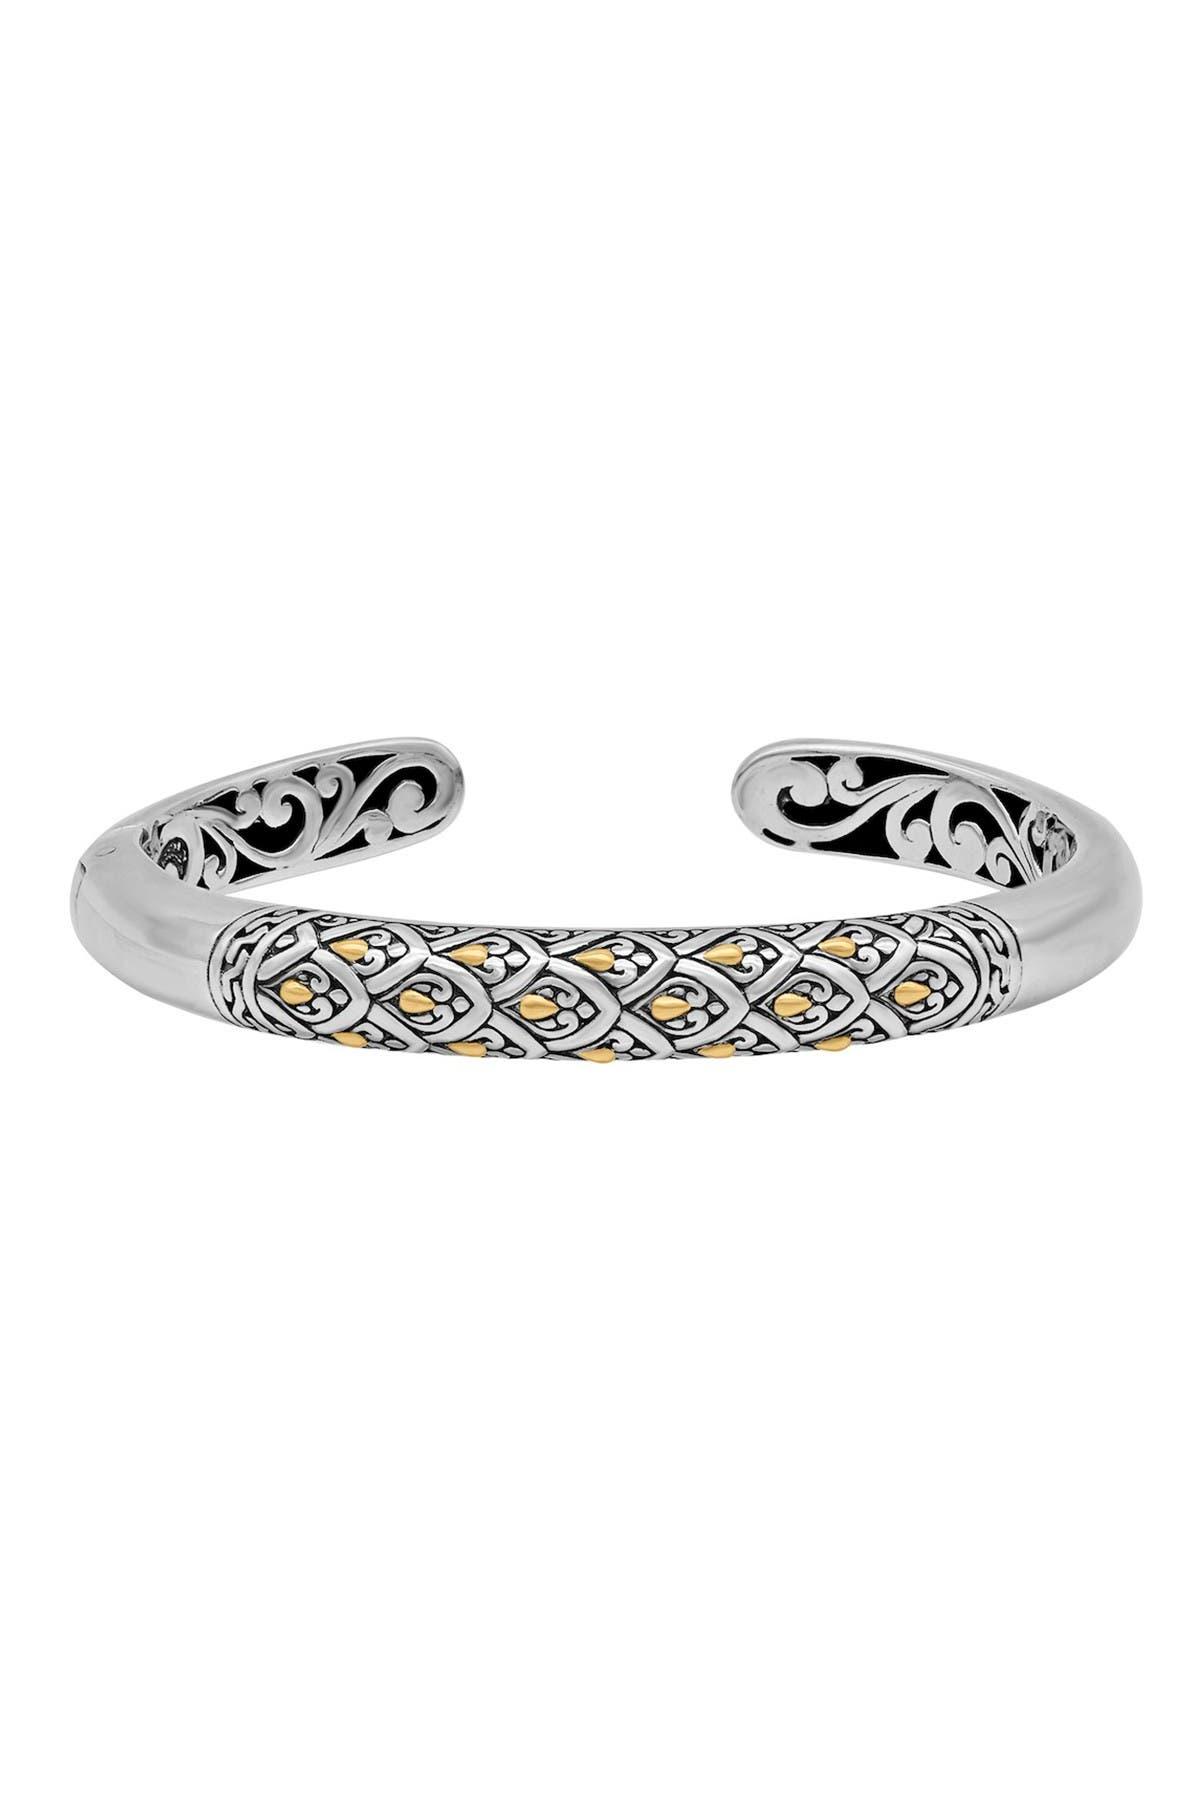 Image of DEVATA 18K Gold Accented Sterling Silver Cuff Bracelet